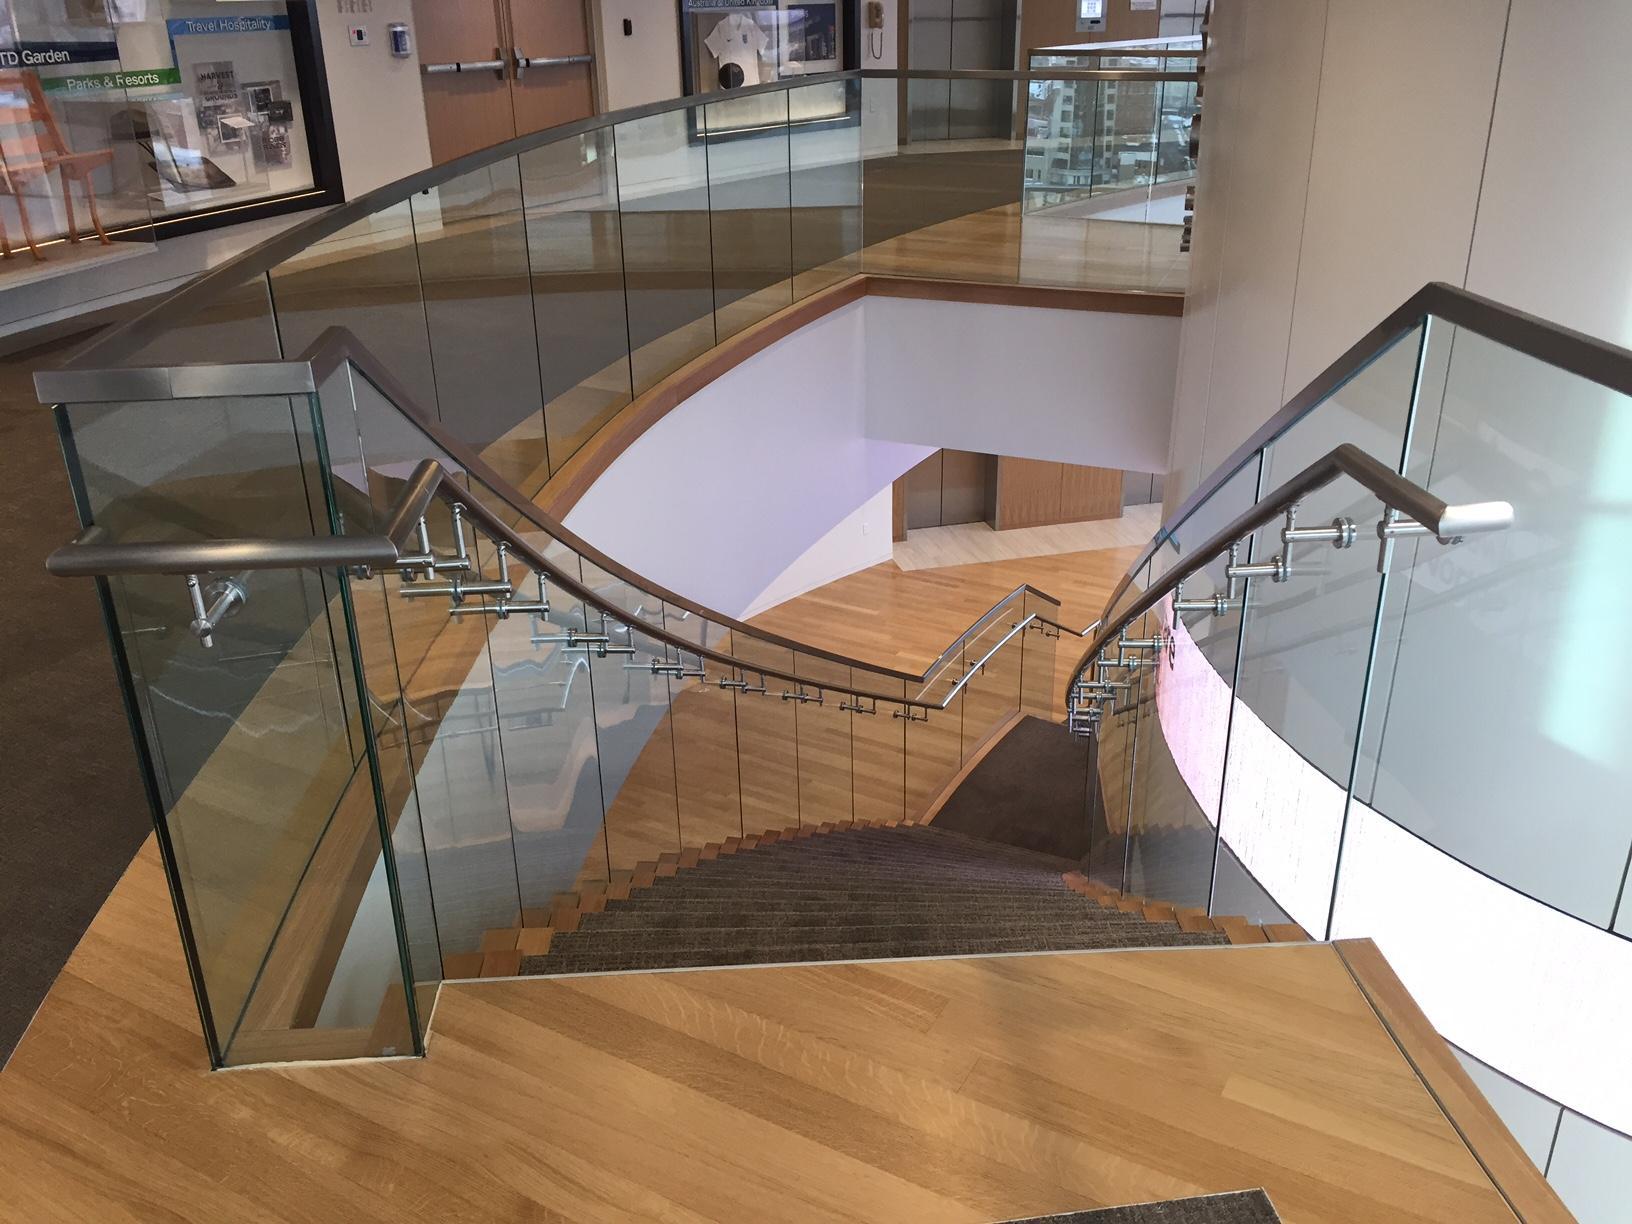 Glasshape Staircase